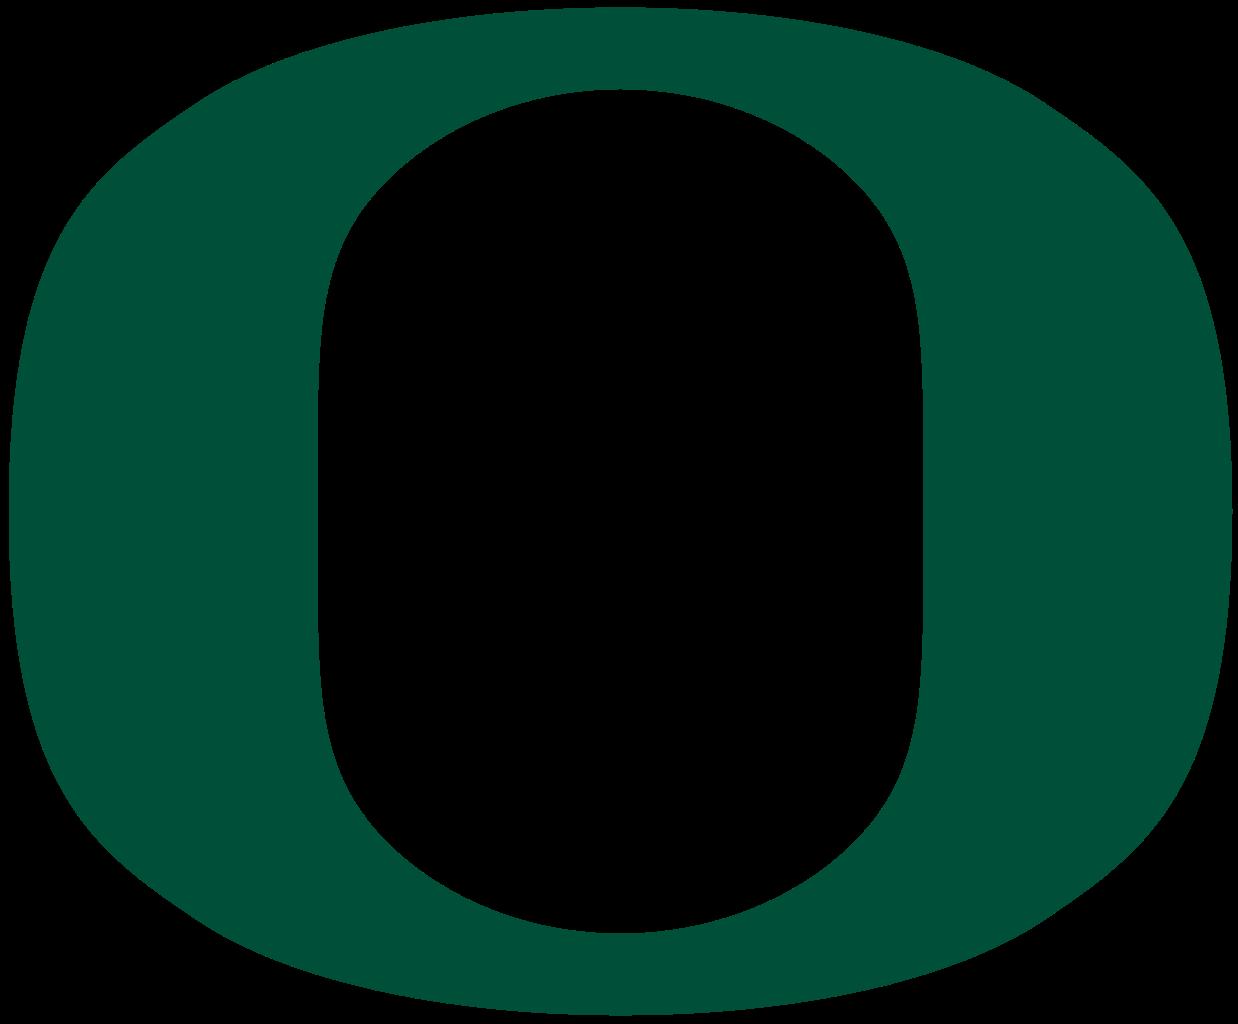 Oregon ducks basketball clipart clip free File:Oregon Ducks logo.svg - Wikipedia clip free